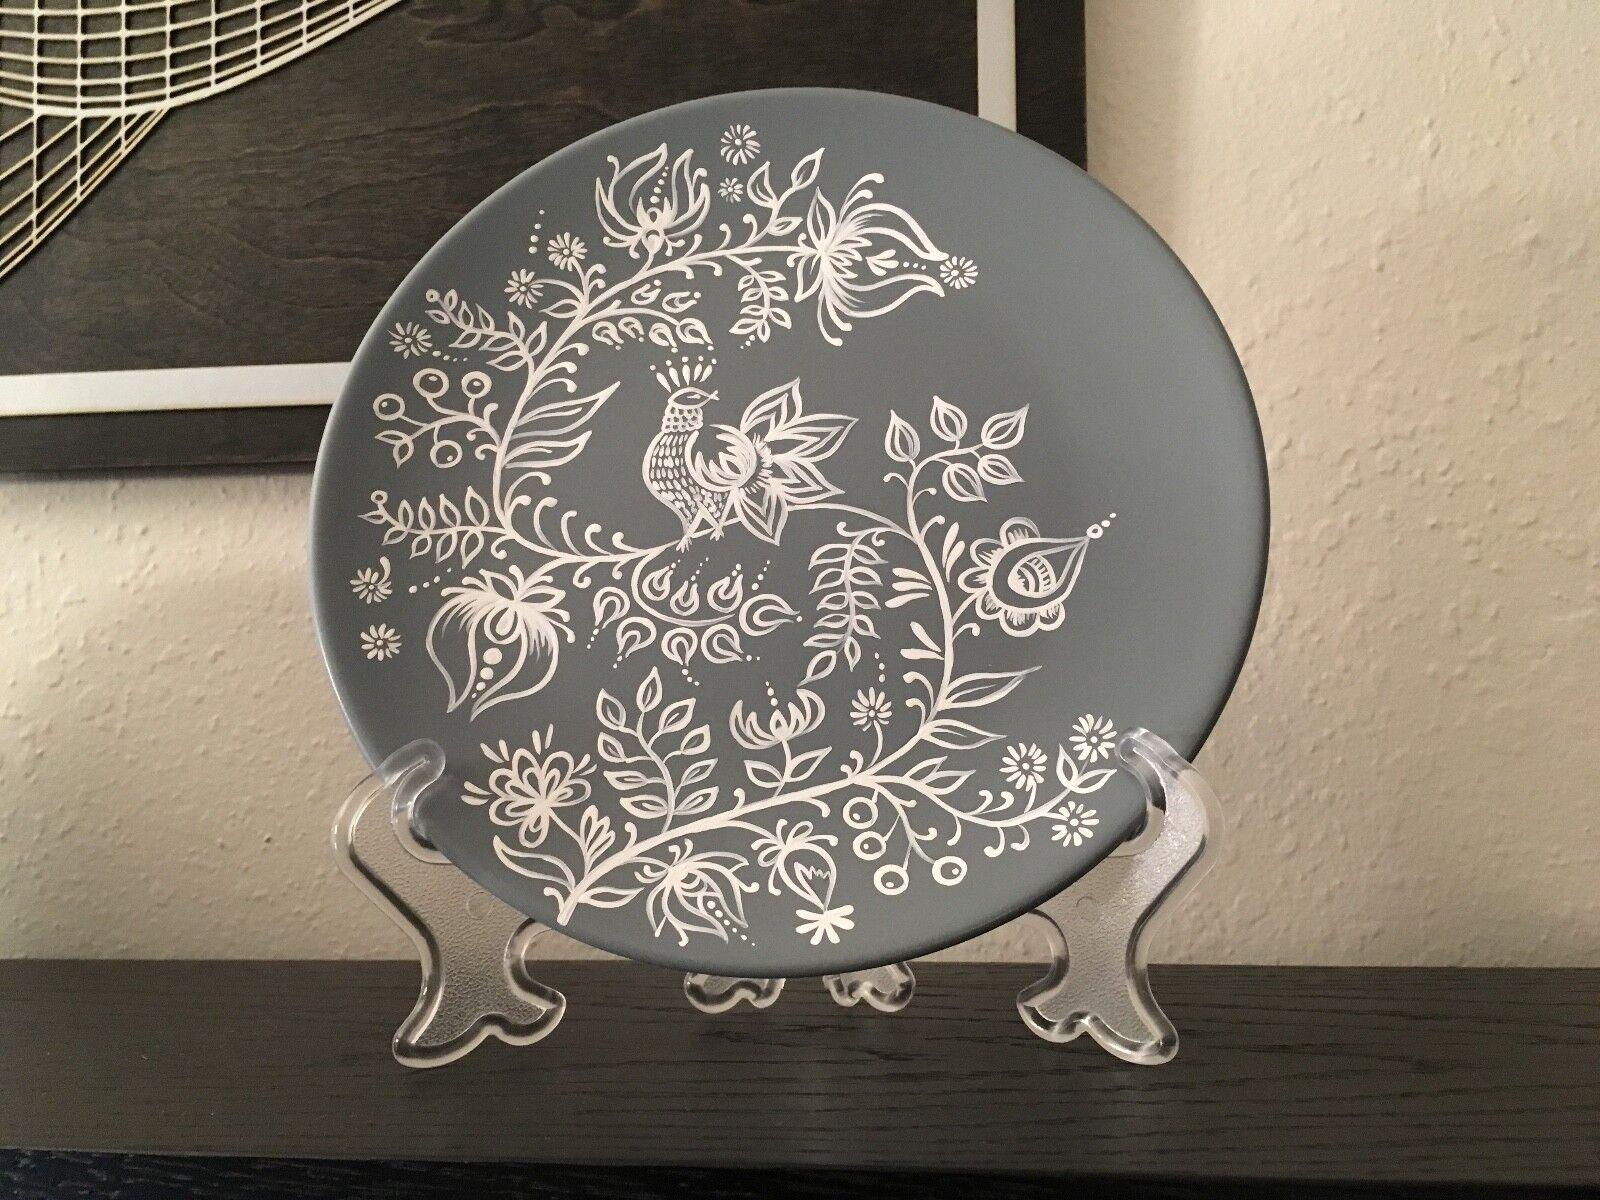 grau & Weiß hand painted decorative plate bird flowers BoHo decor 7.75  + stand